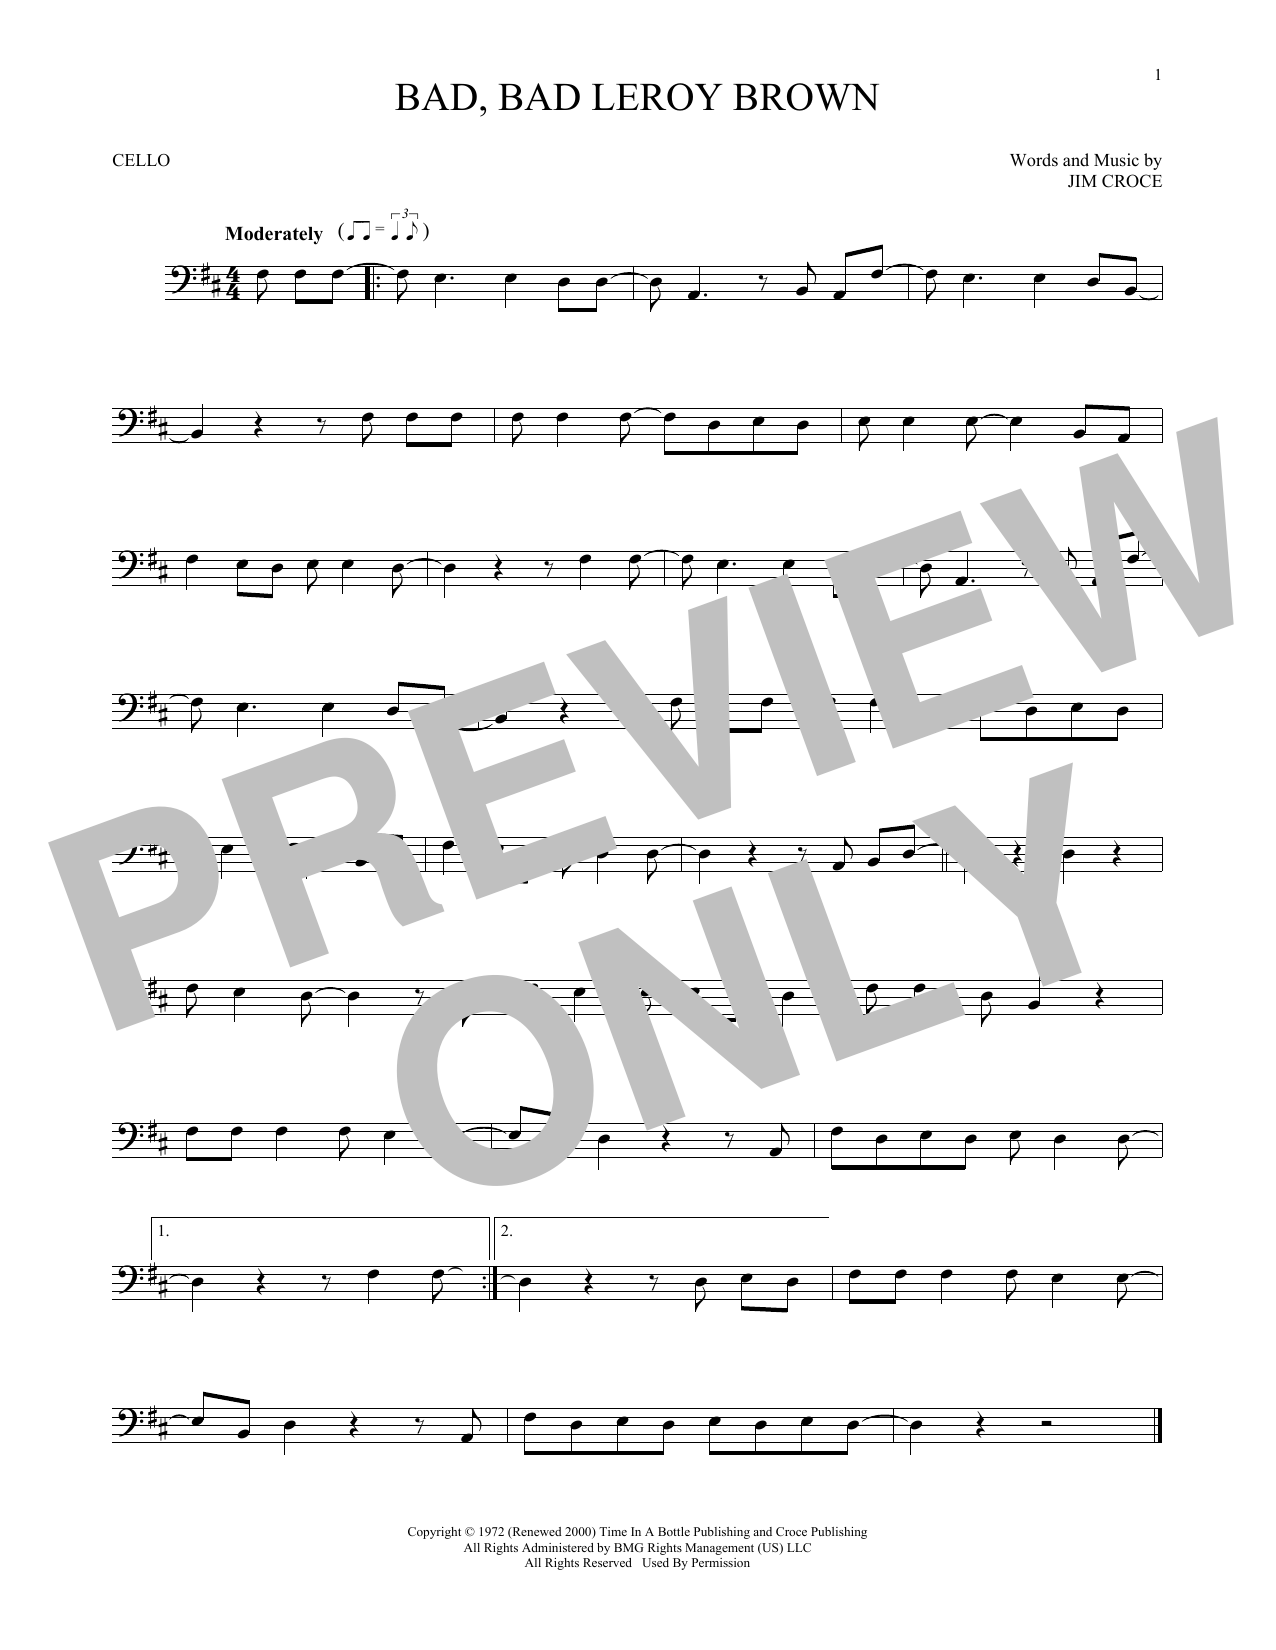 Bad, Bad Leroy Brown (Cello Solo)